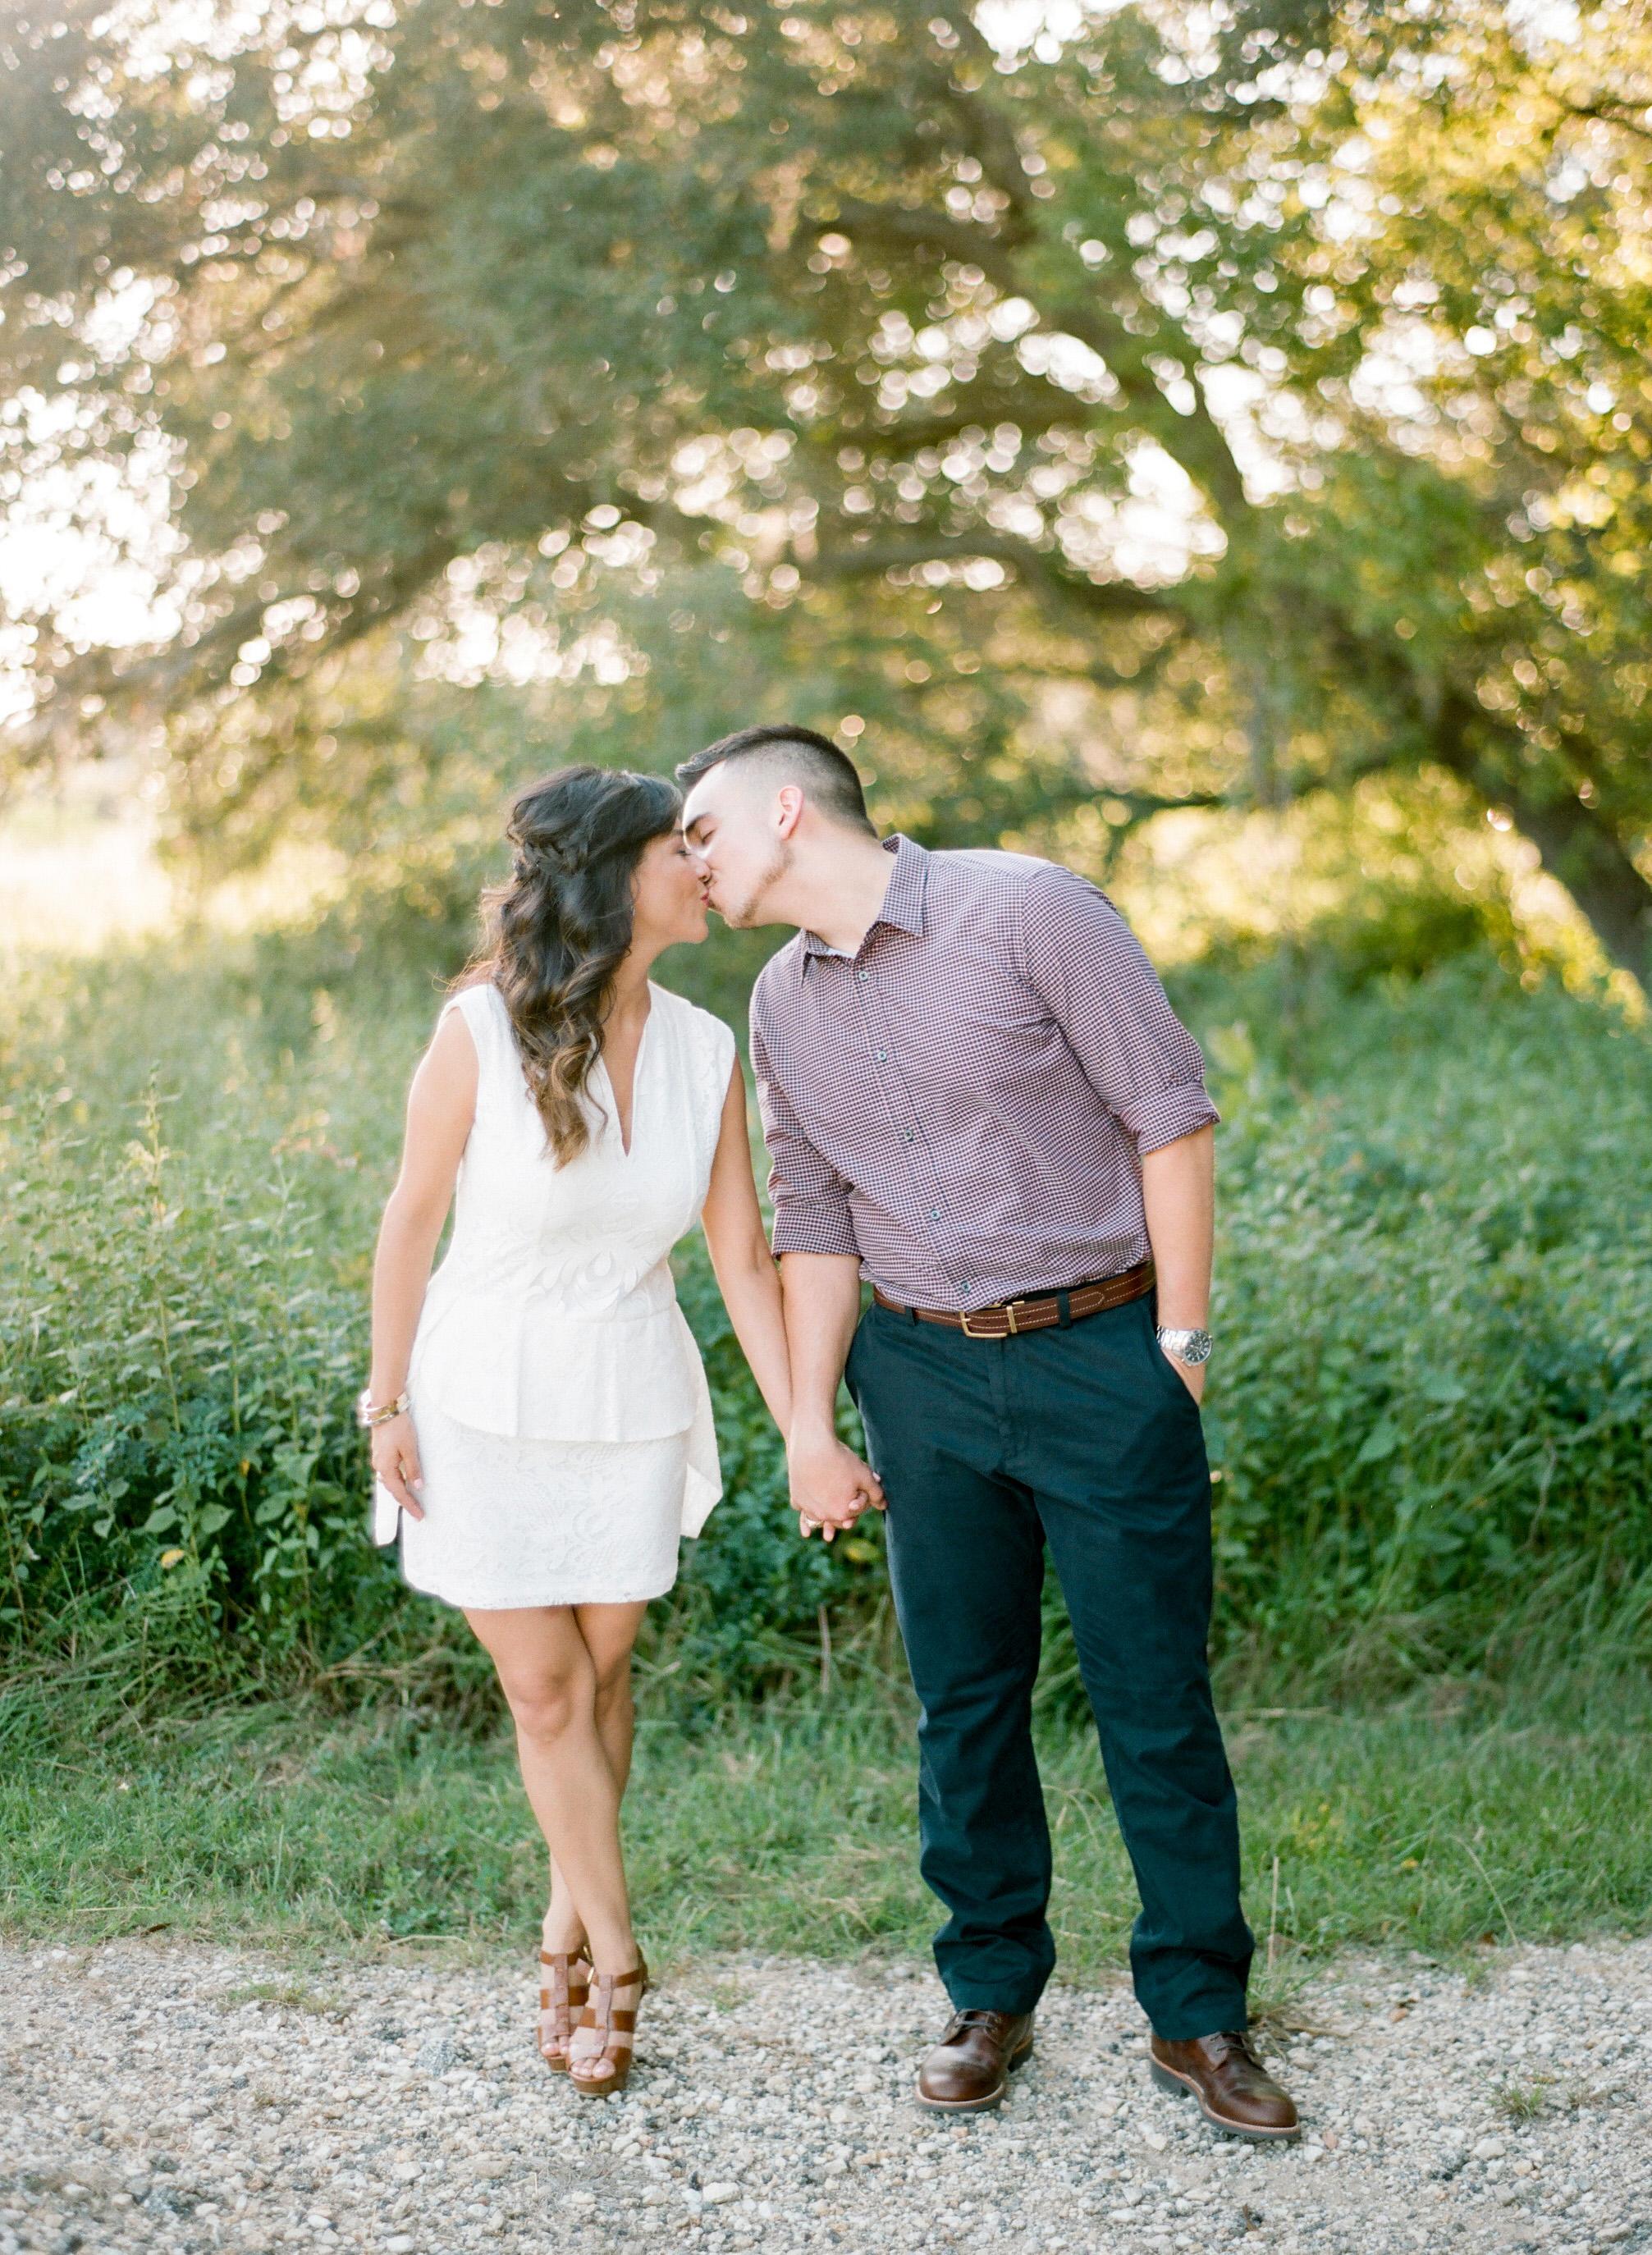 Dana-Fernandez-Photography-Houston-Wedding-Photographer-Film-Style-Me-Pretty-3.jpg